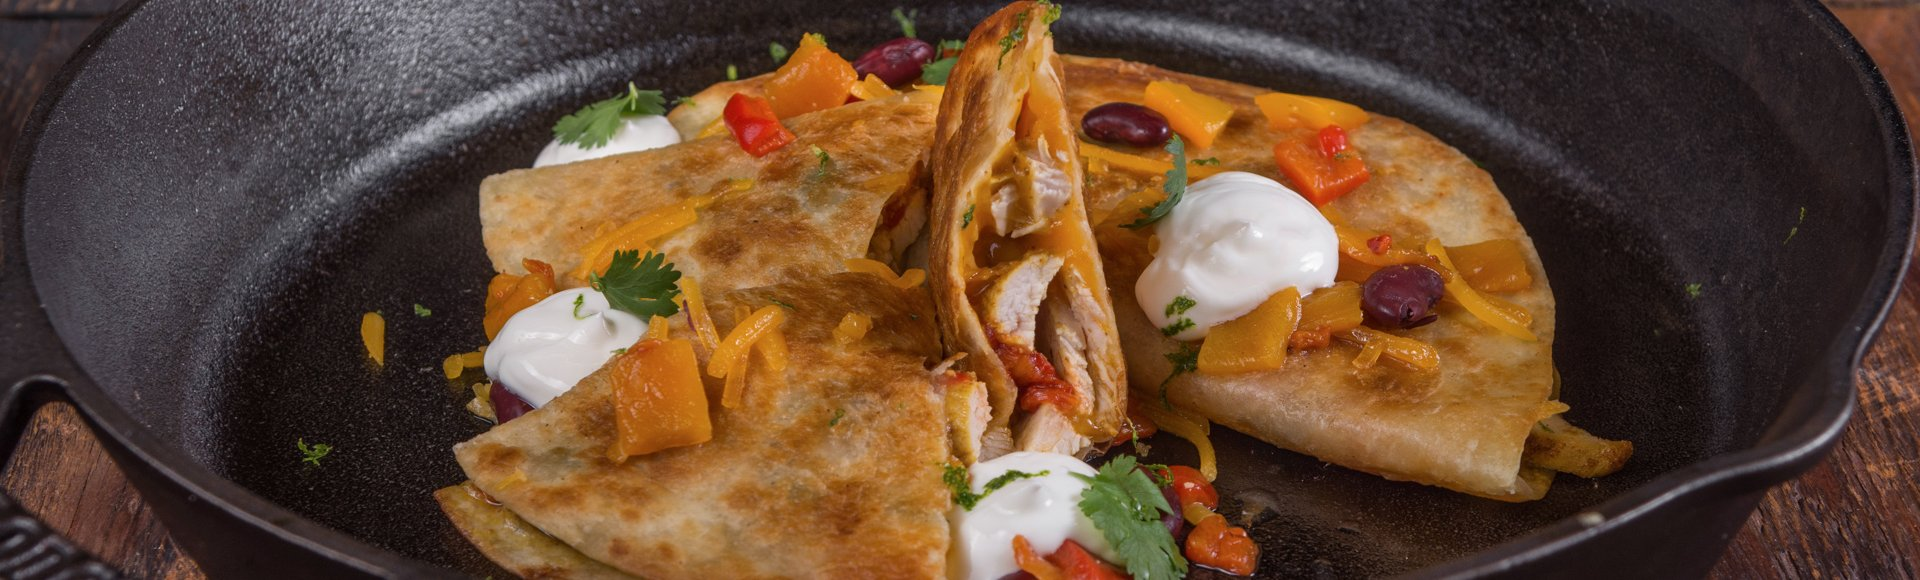 Quesadillas με μαριναρισμένο κοτόπουλο, τσένταρ & πιπεριές